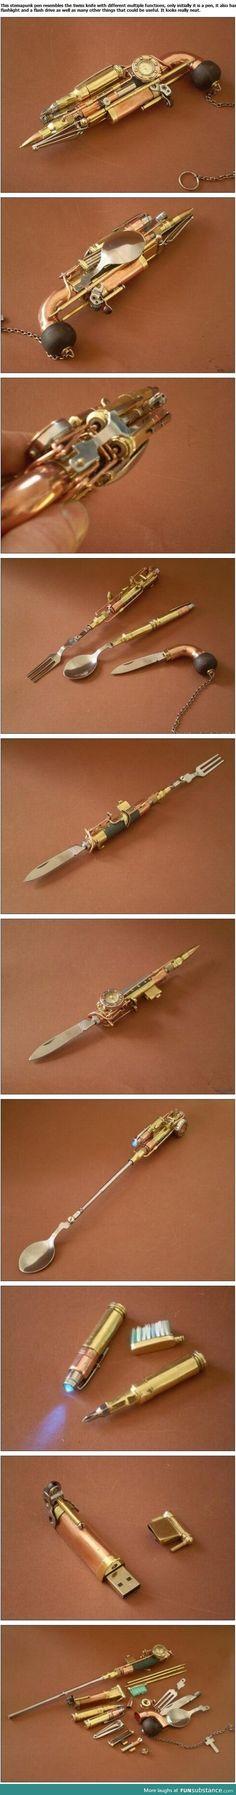 Steampunk pen that looks like a gun